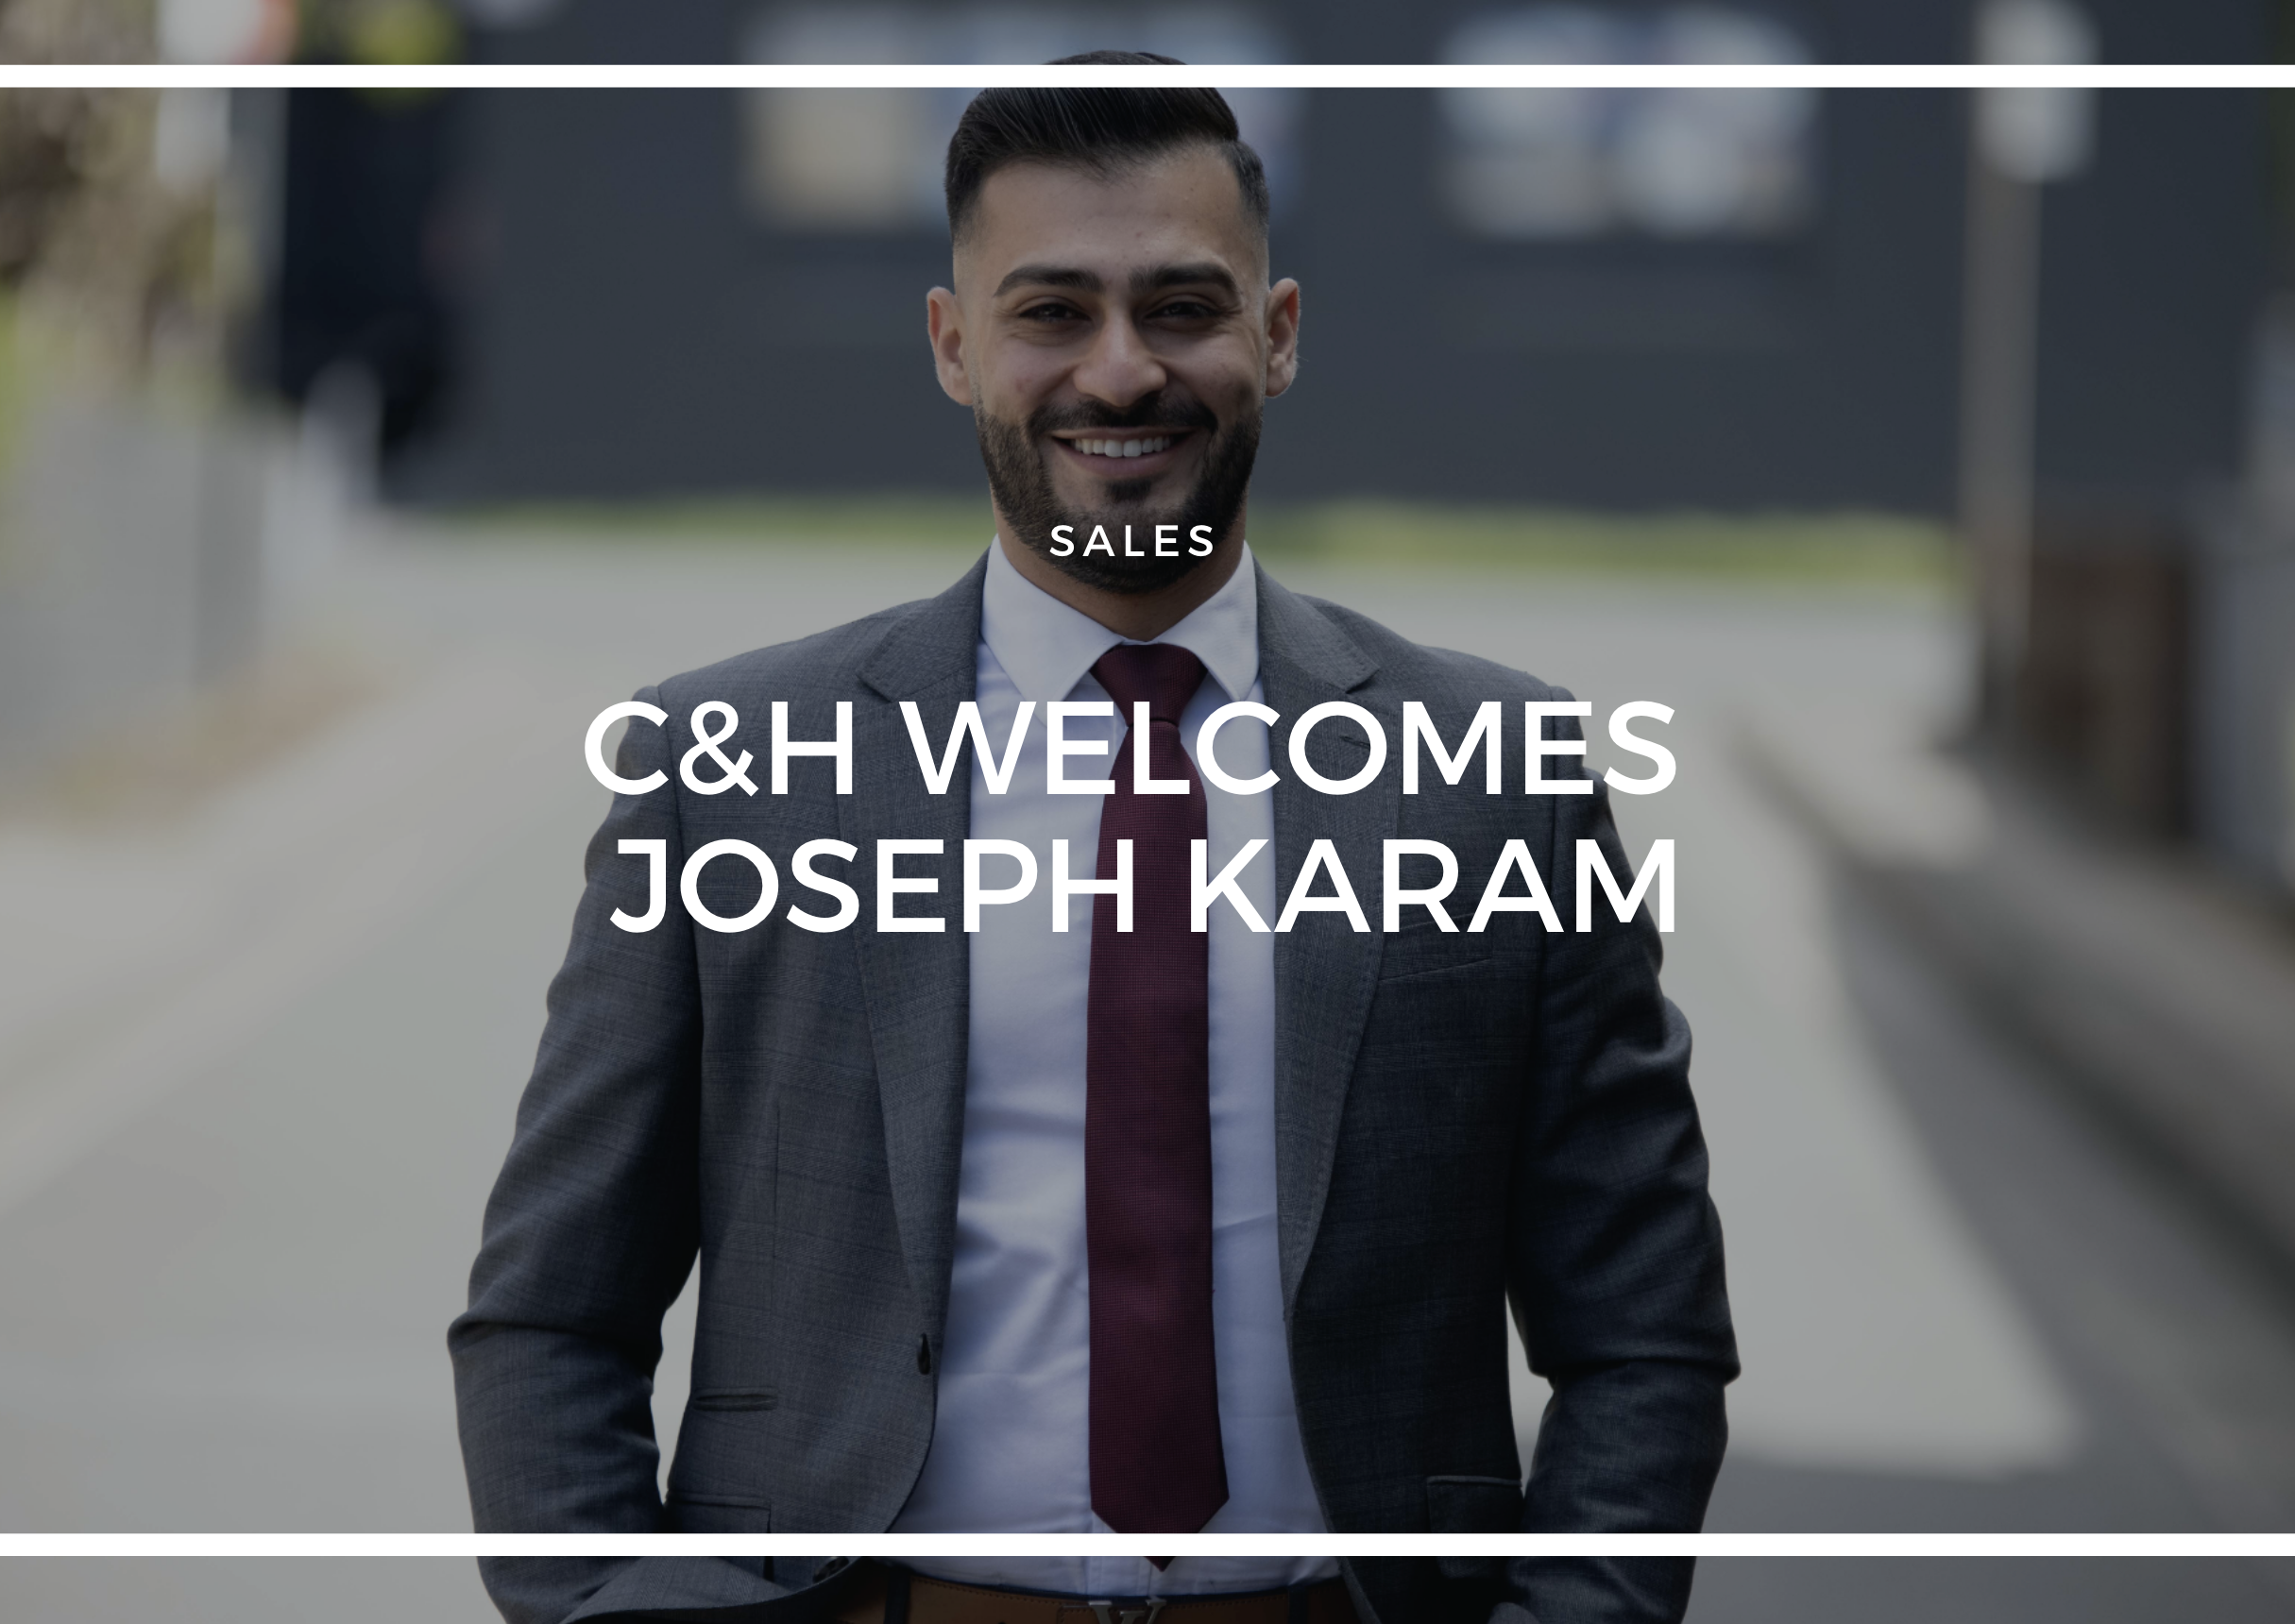 WELCOMING LOCAL JOSEPH KARAM TO THE MARRICKVILLE OFFICE